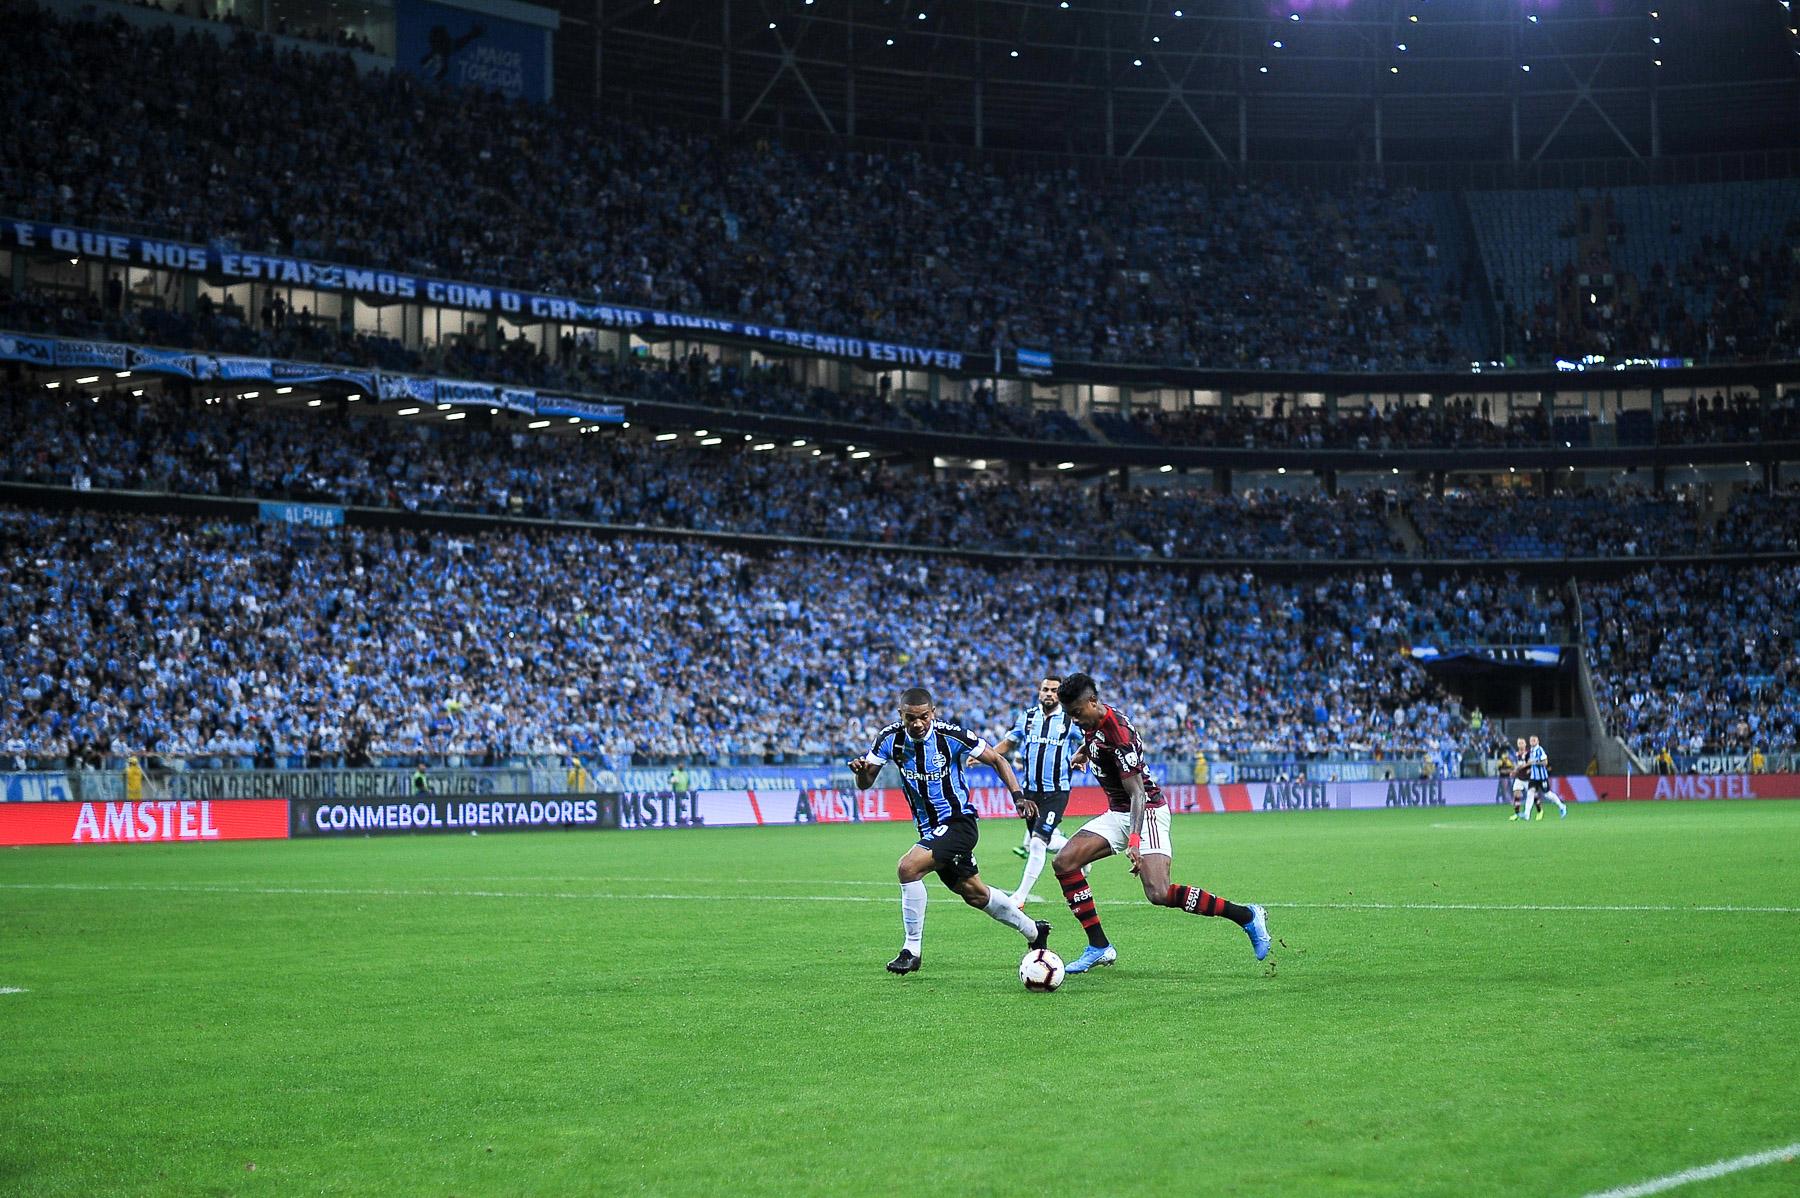 Gremio_X_Flamengo_dudabairros_Eleven_182